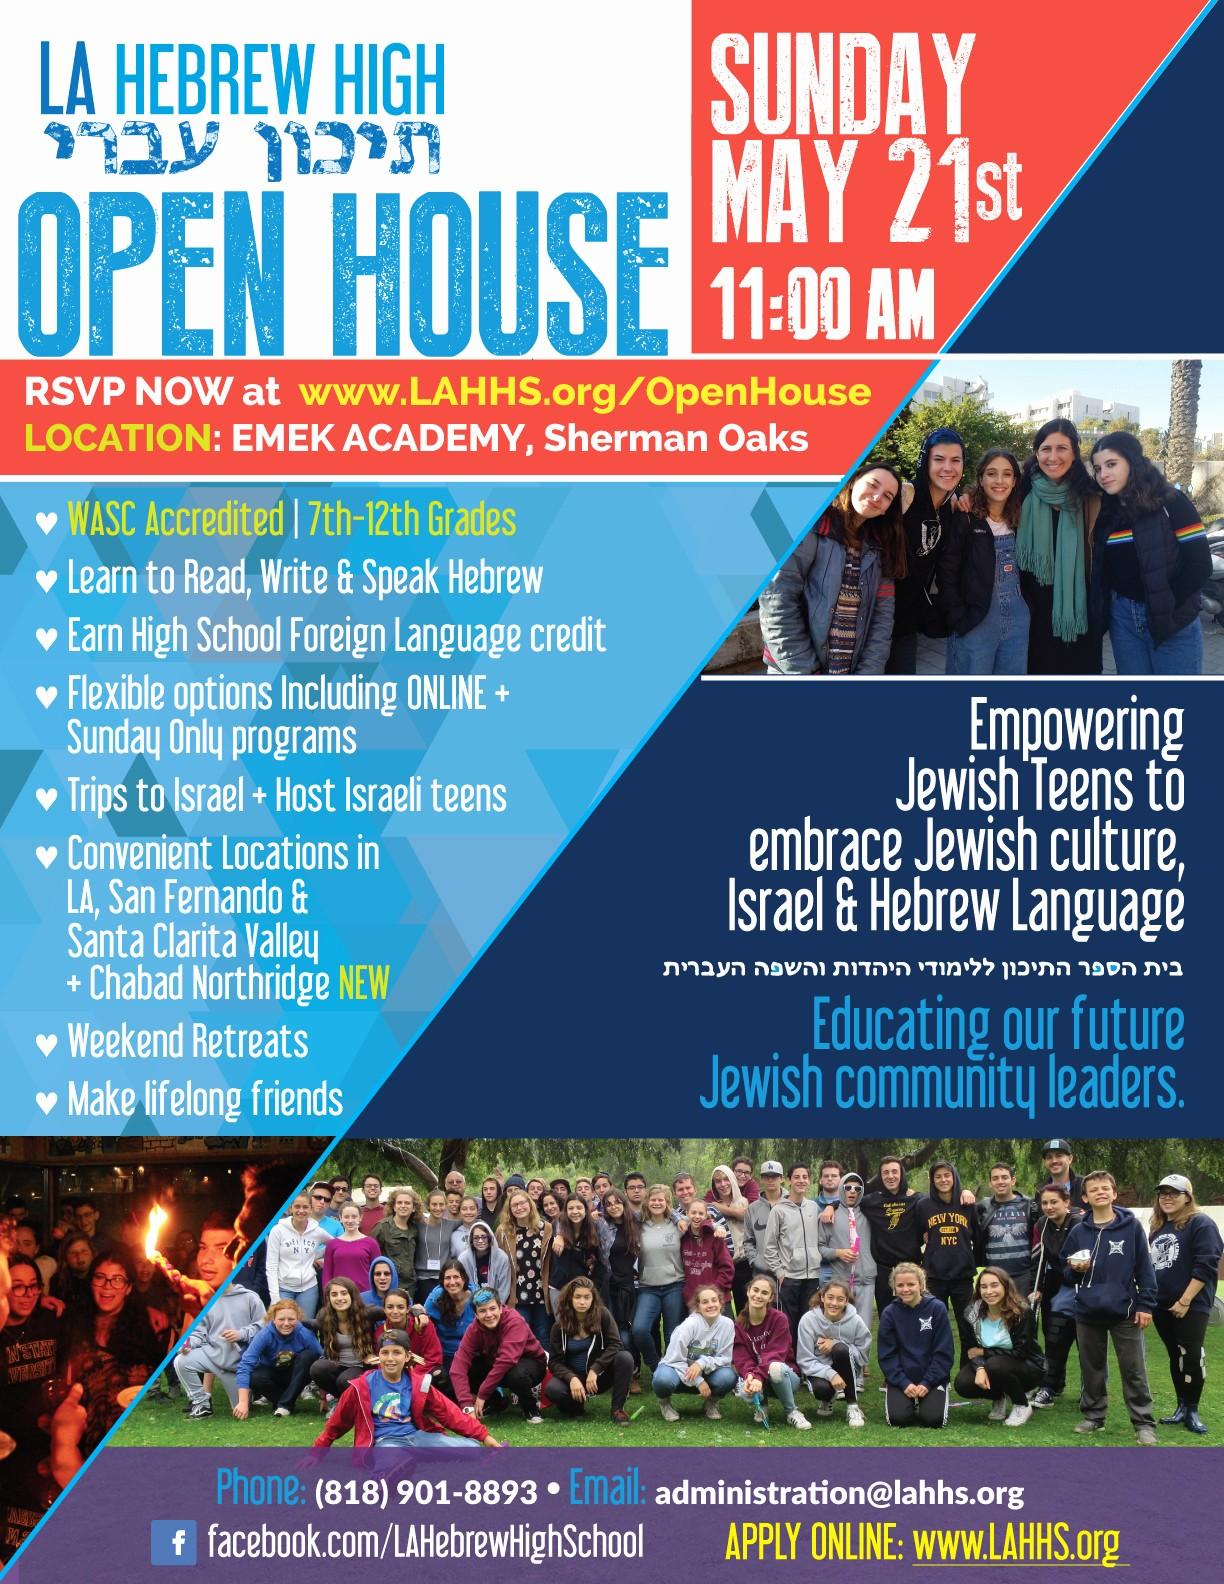 Open House Flyers for School Beautiful Open House Los Angeles Hebrew High School